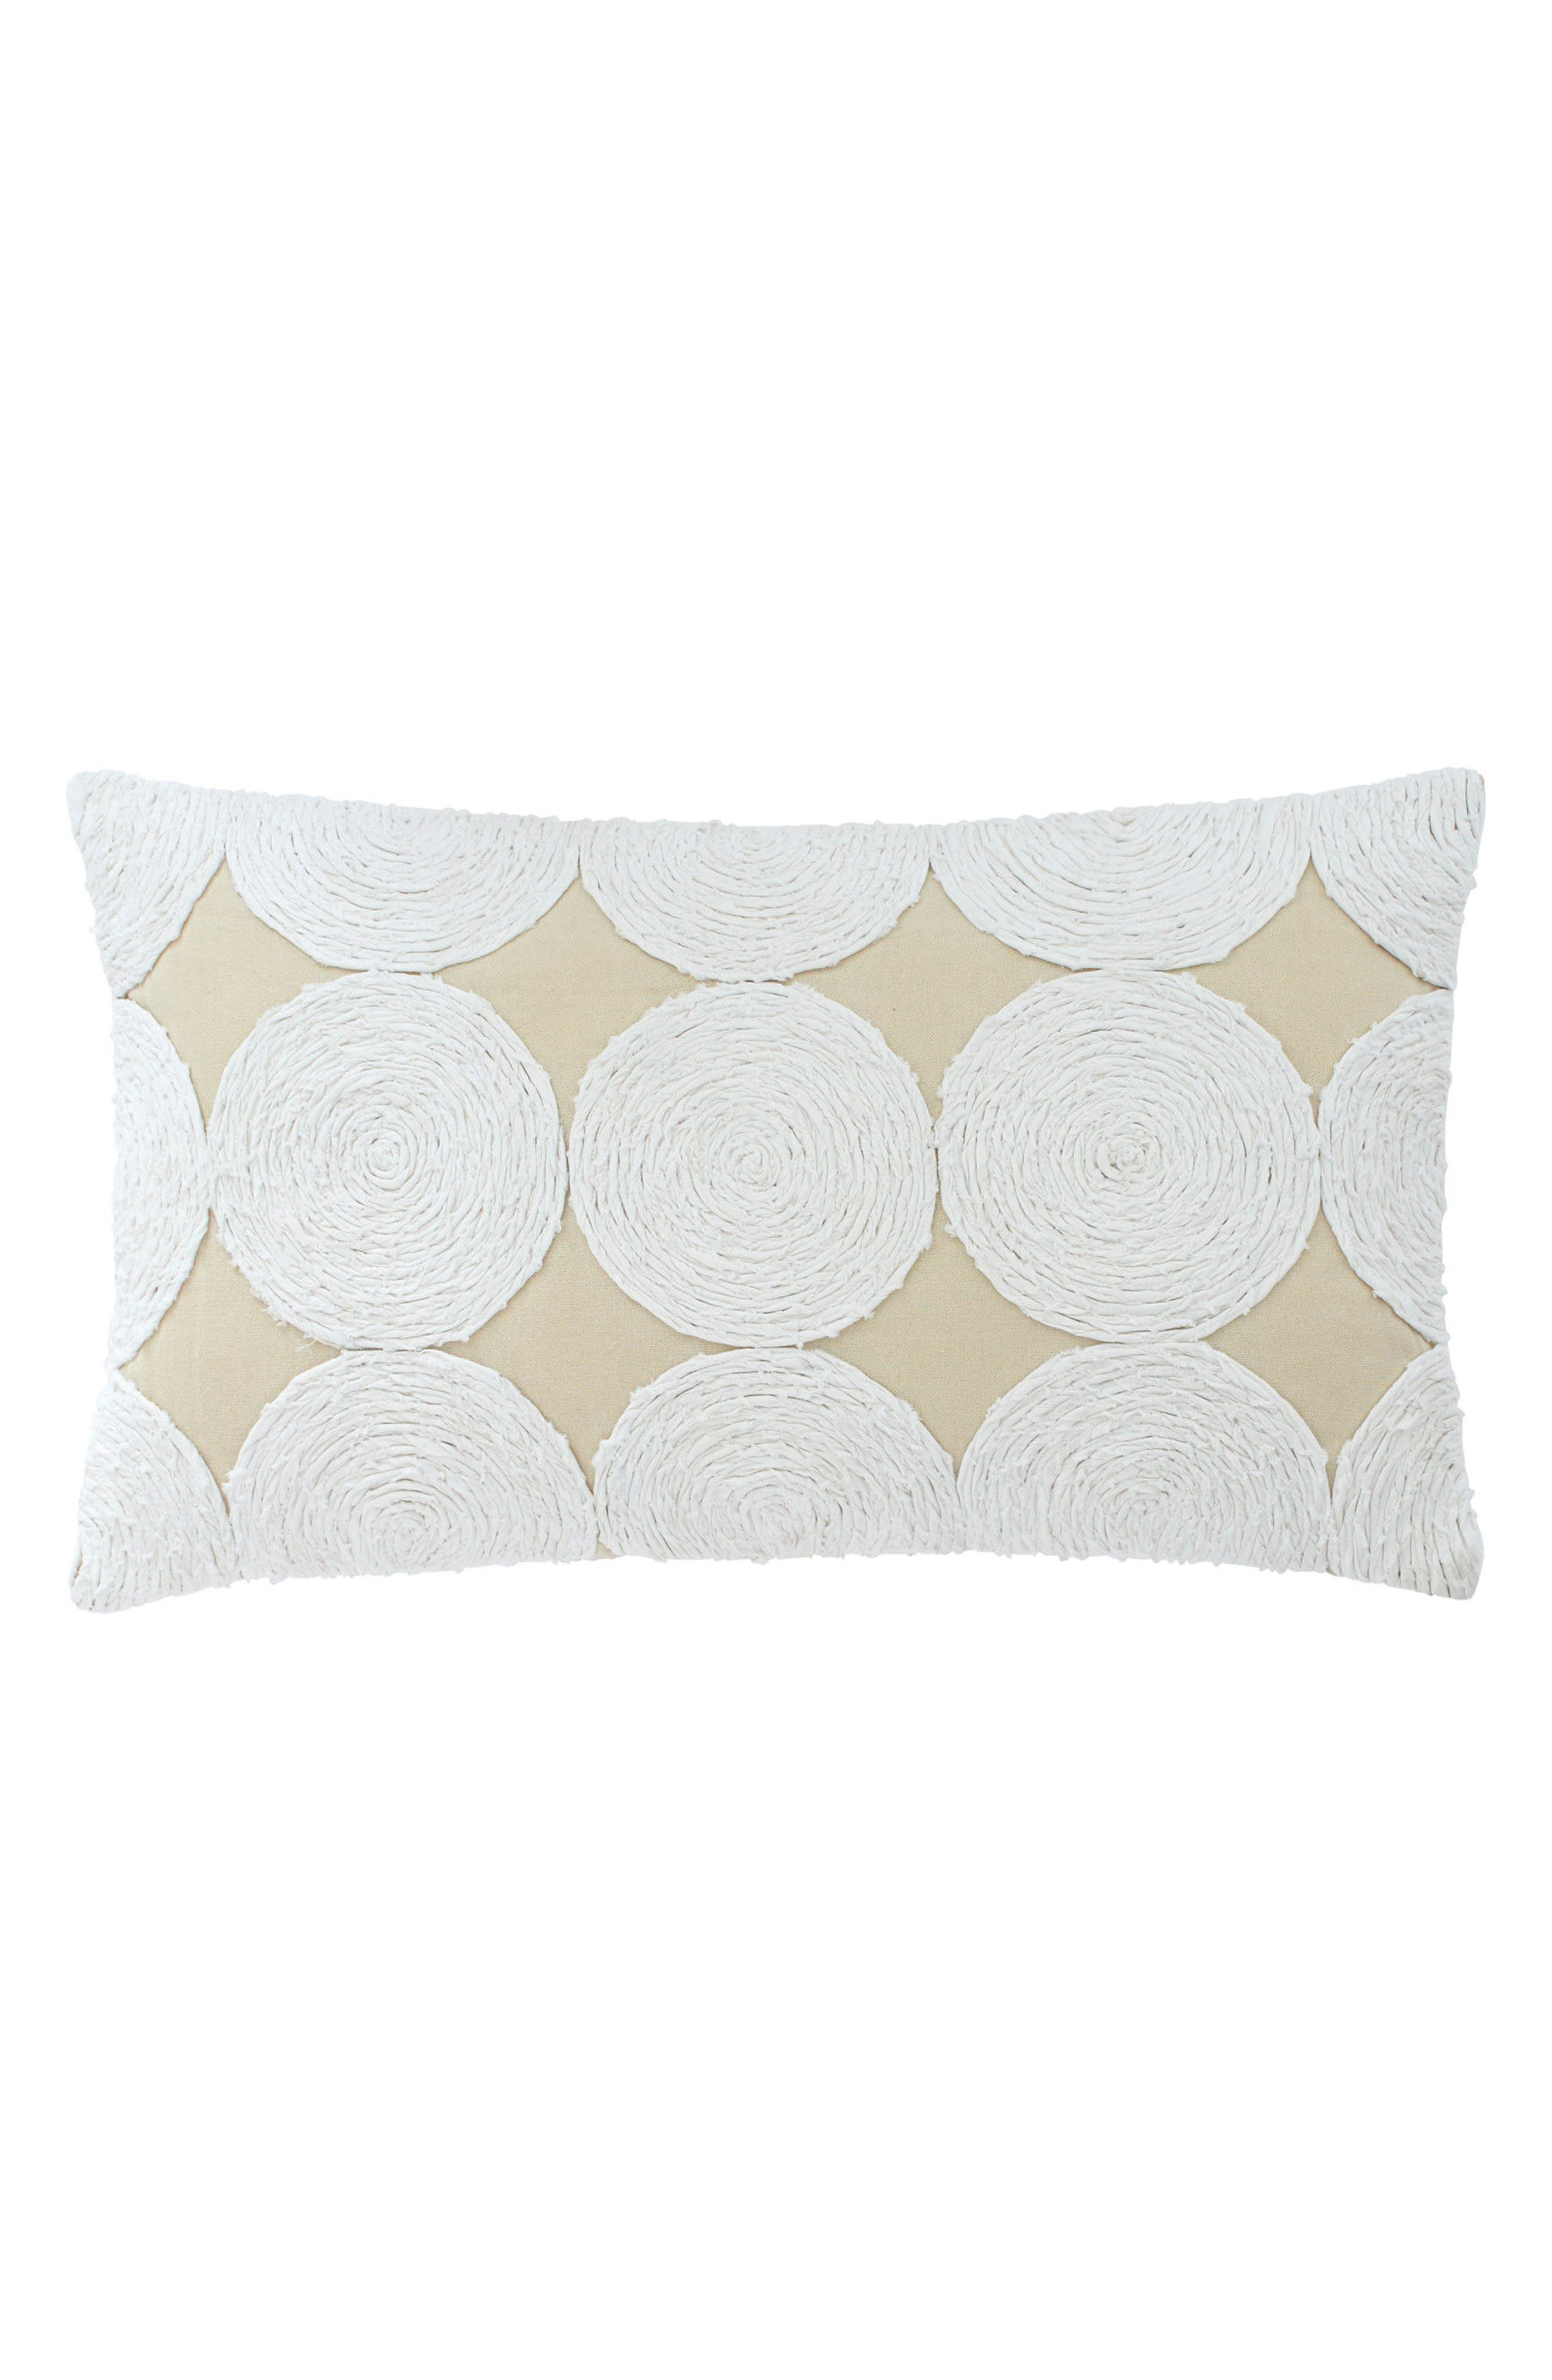 Southern Hospitality Appliqué Accent Pillow,                         Main,                         color, 250